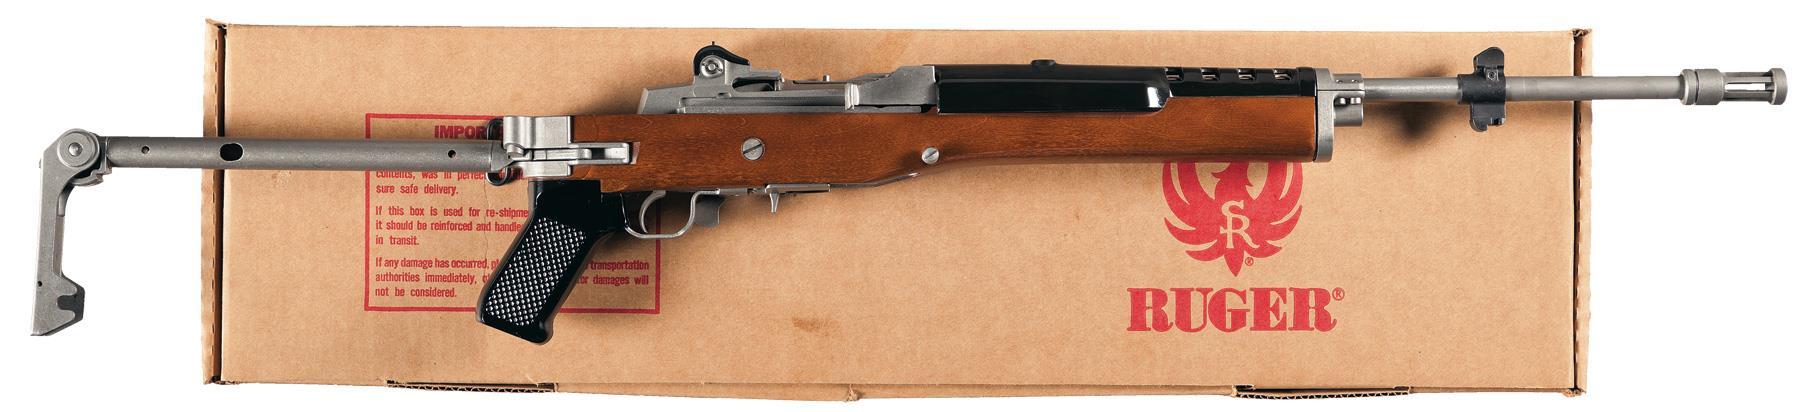 Ruger Mini 14 Folding Stock Semi-Automatic Carbine